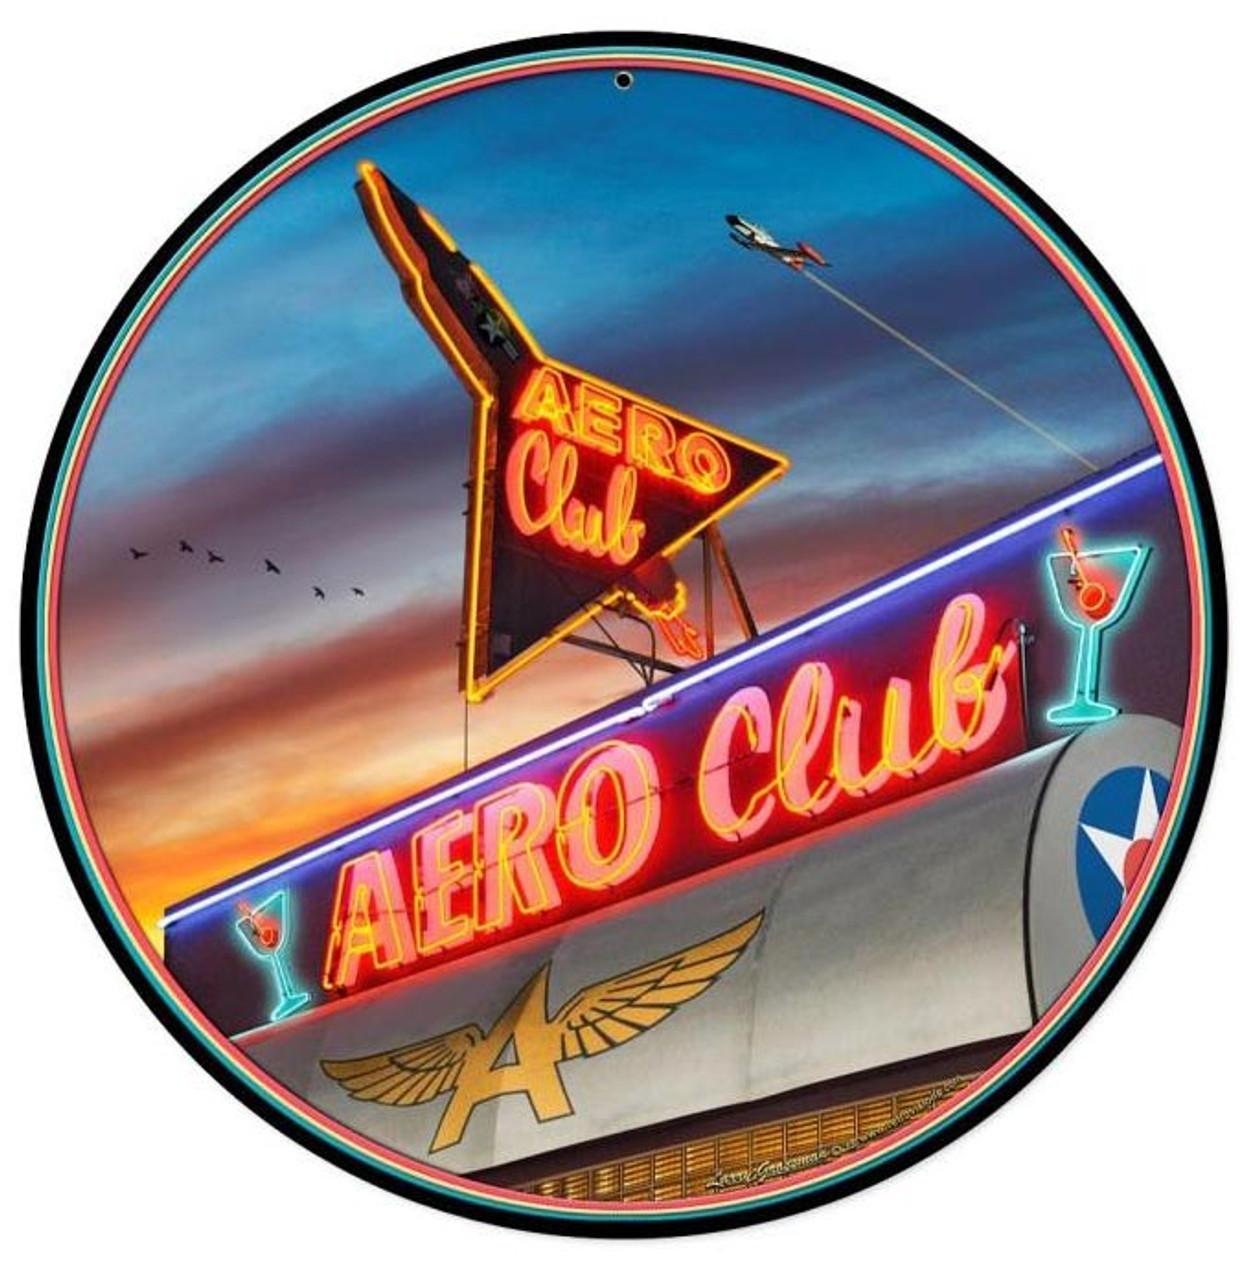 Aero Club Round Round Metal Sign 14 x 14 Inches